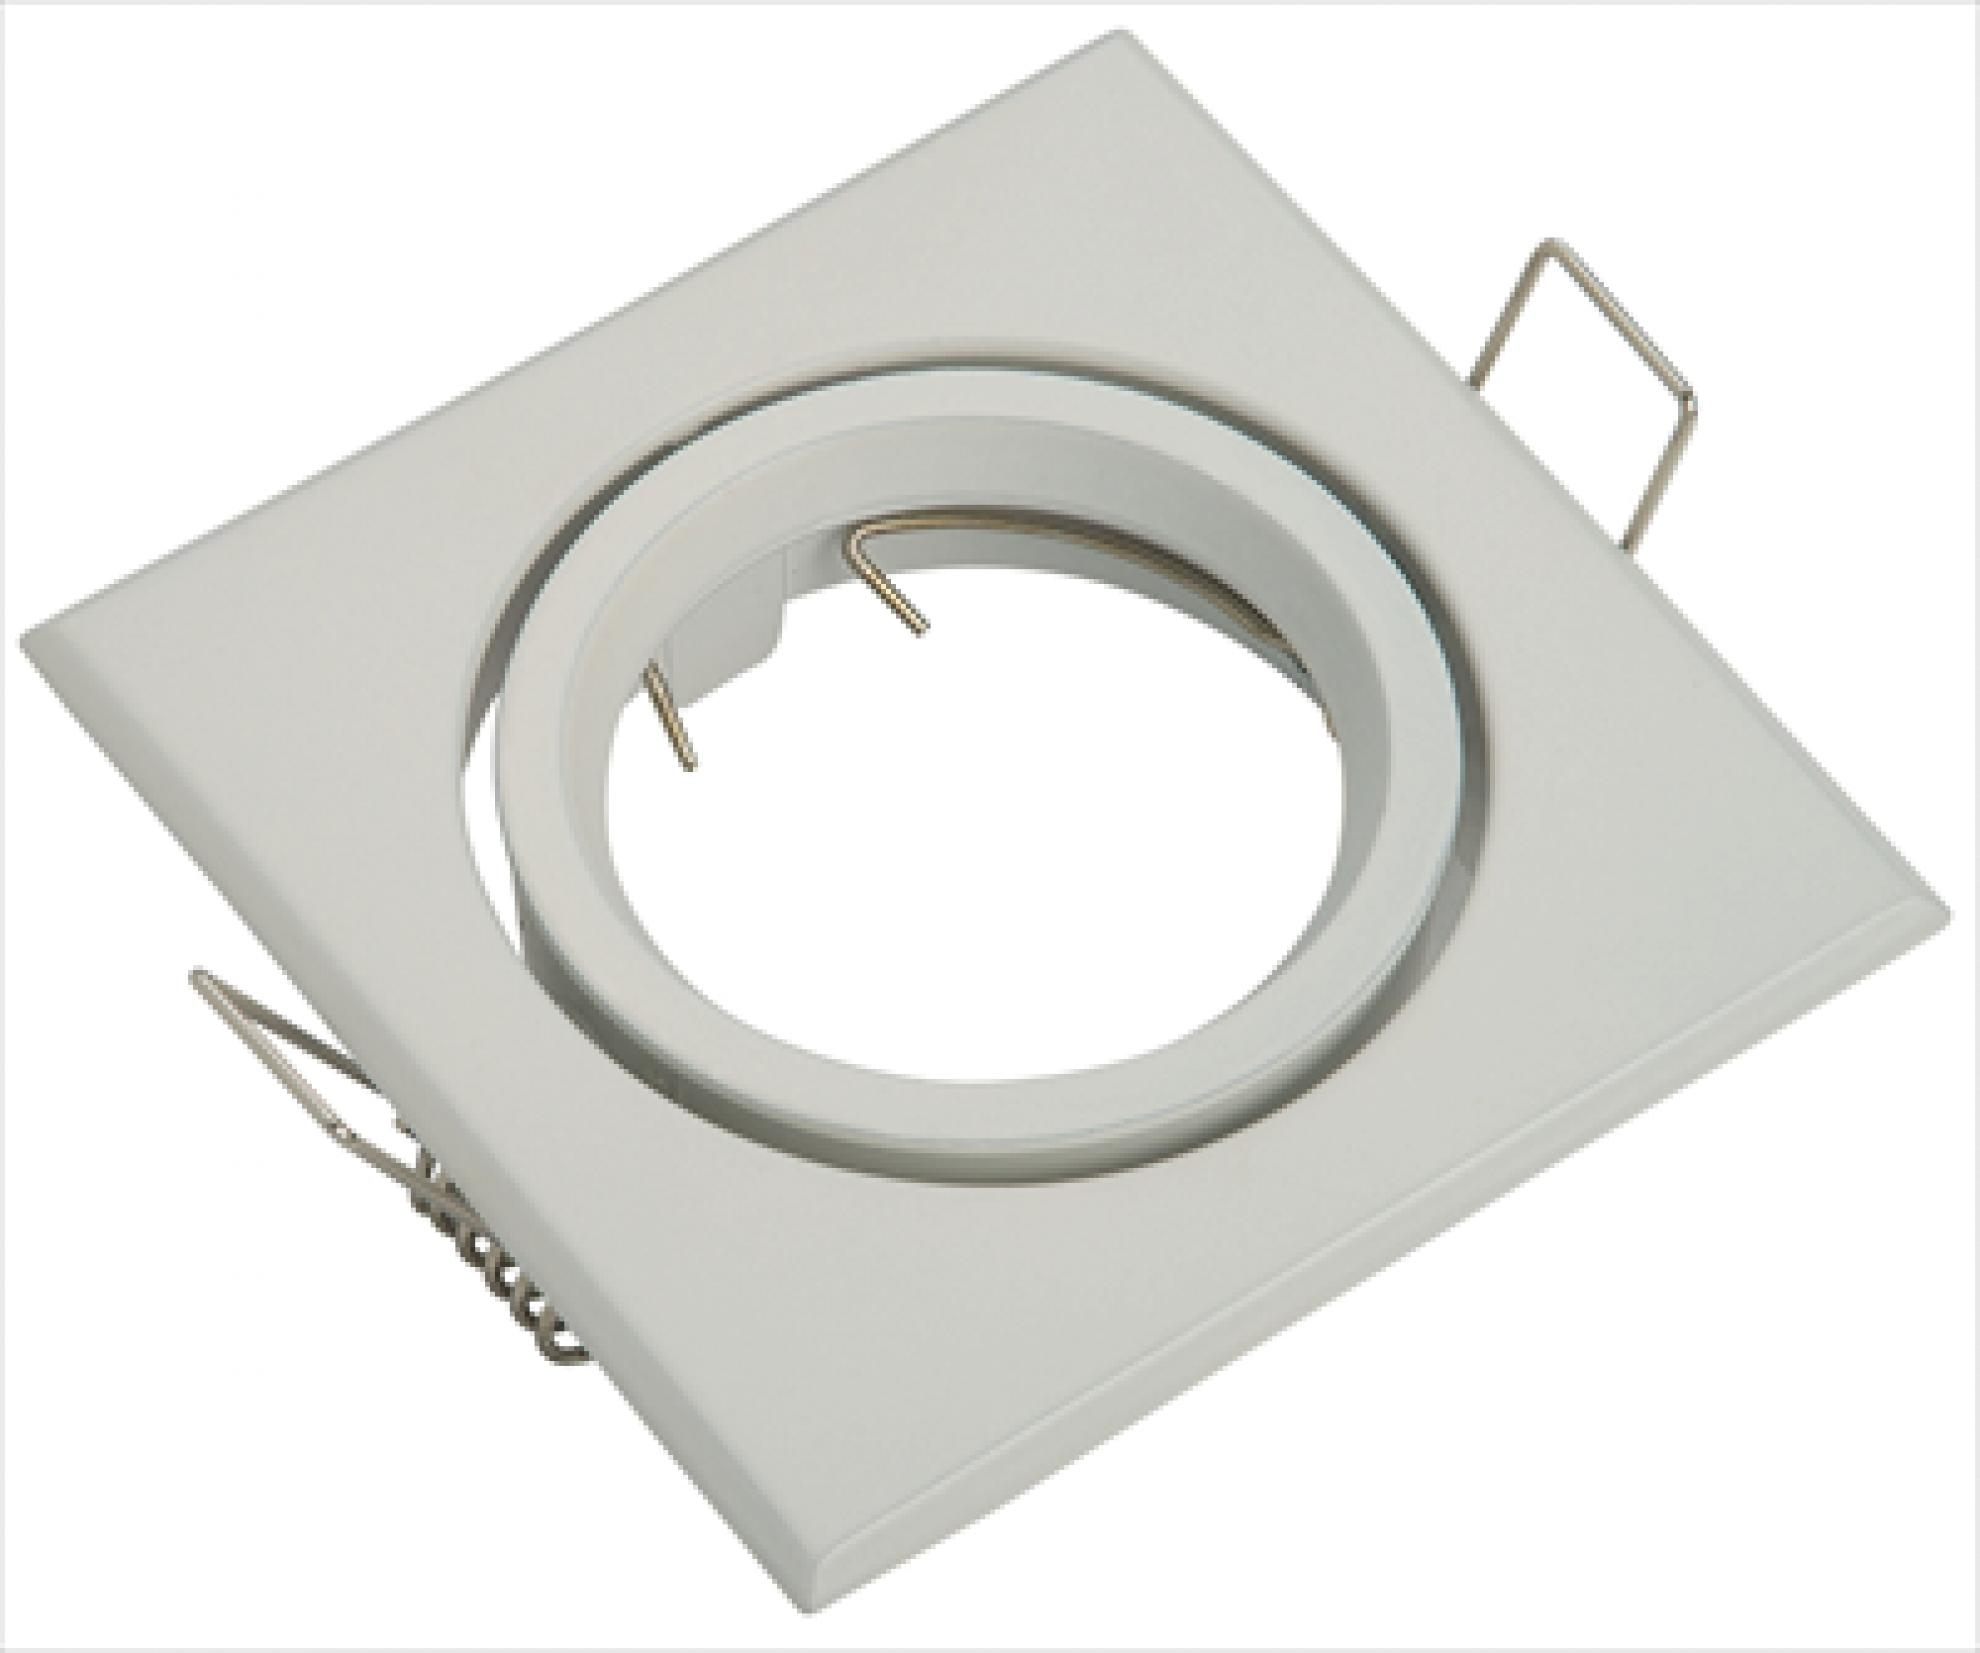 SPOT LED DICR 3W EMB QUAD 2700K BIV MR11